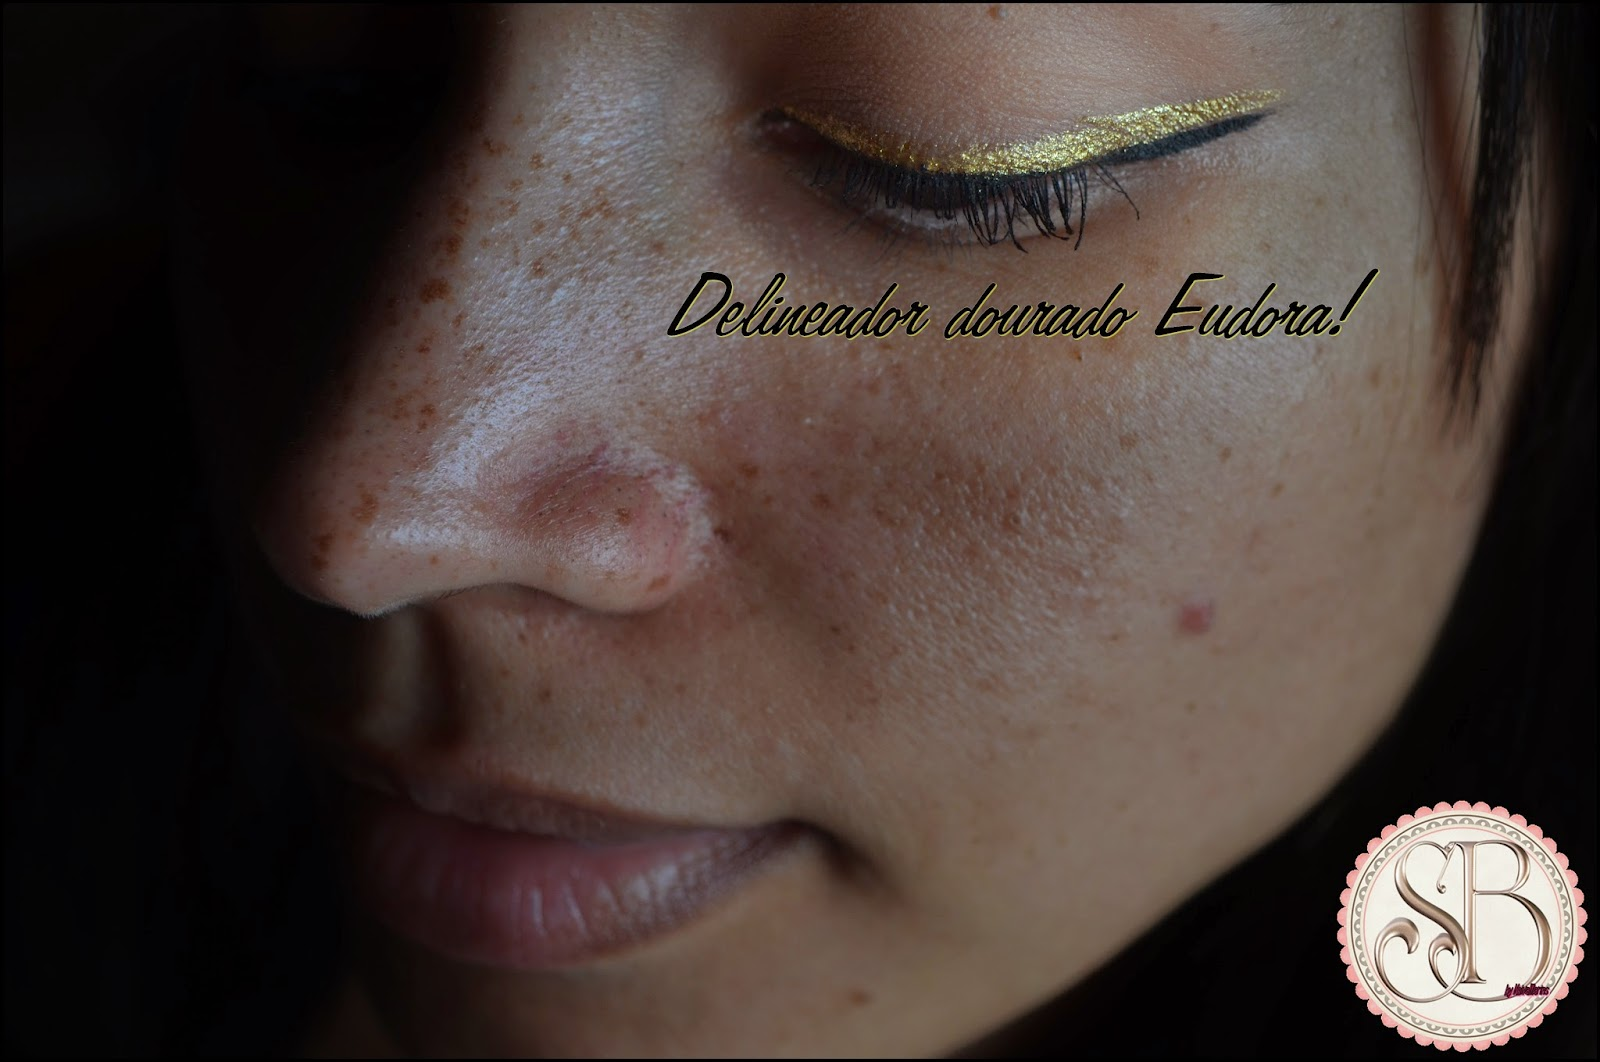 Somando Beleza, Delineador Dourado, Royal Liner, Eudora, Neiva Marins, Linda Linda, Dalí